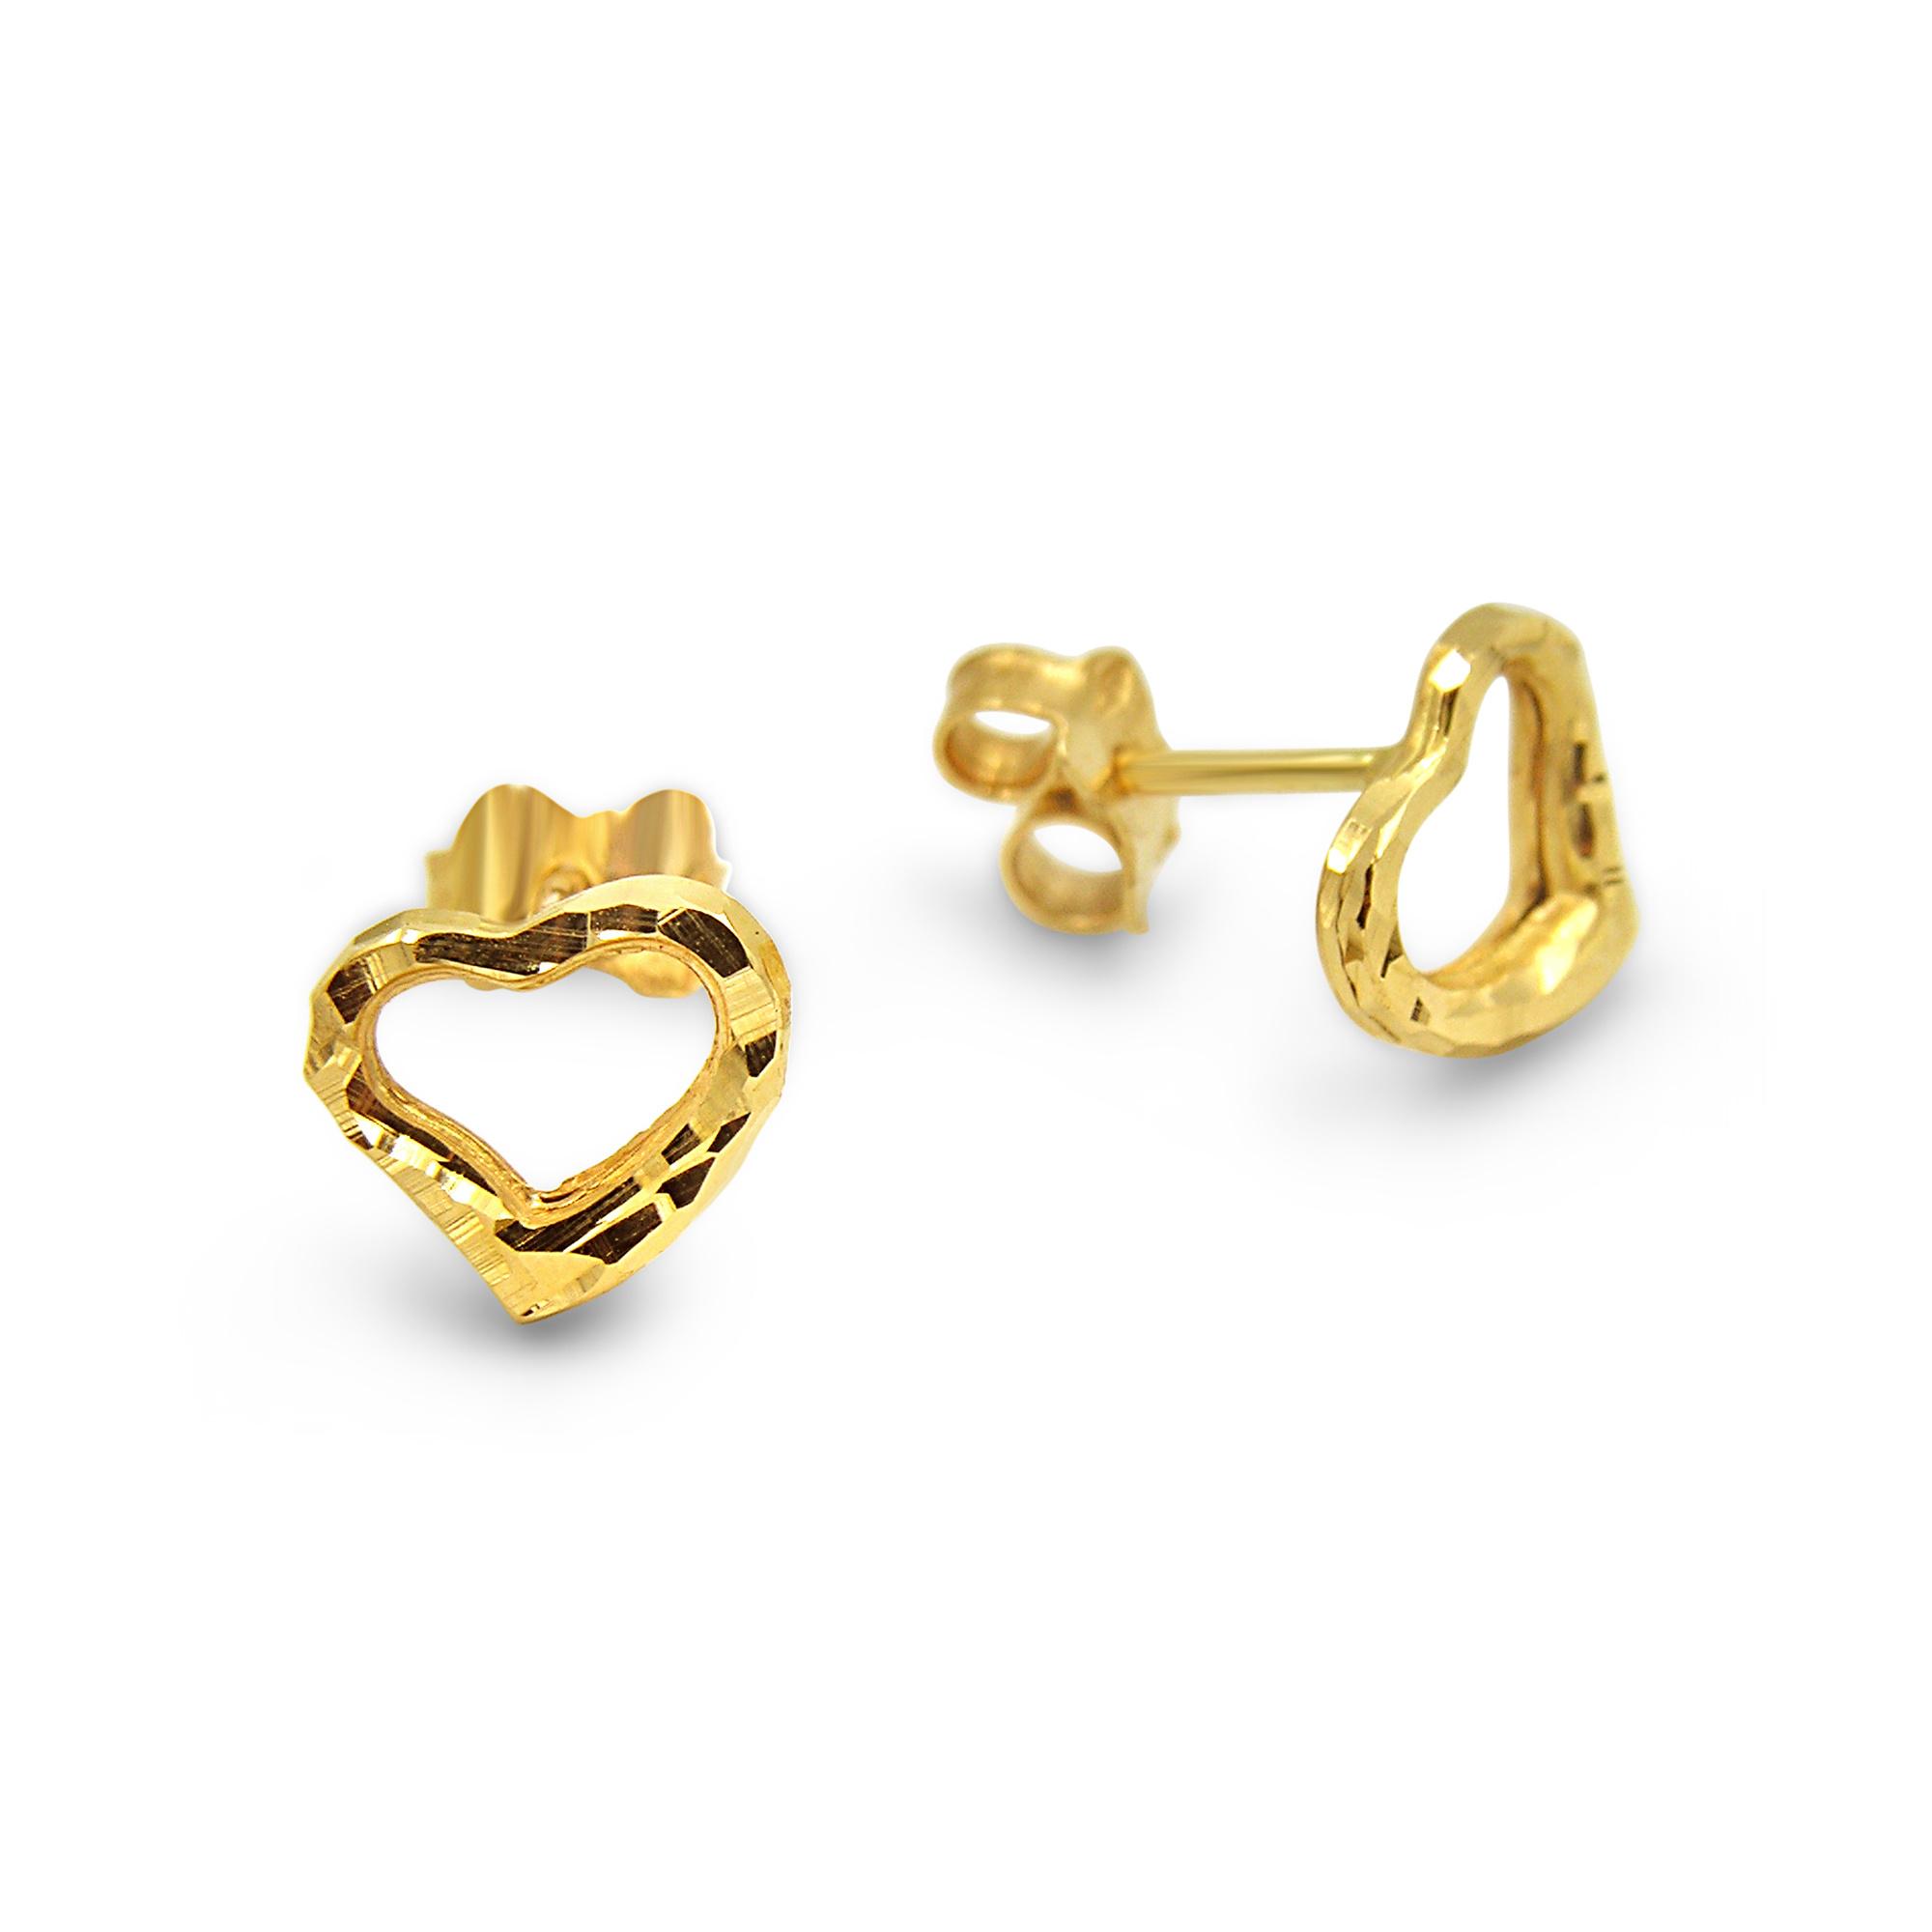 18 karat yellow gold earrings heart with shiny  finish